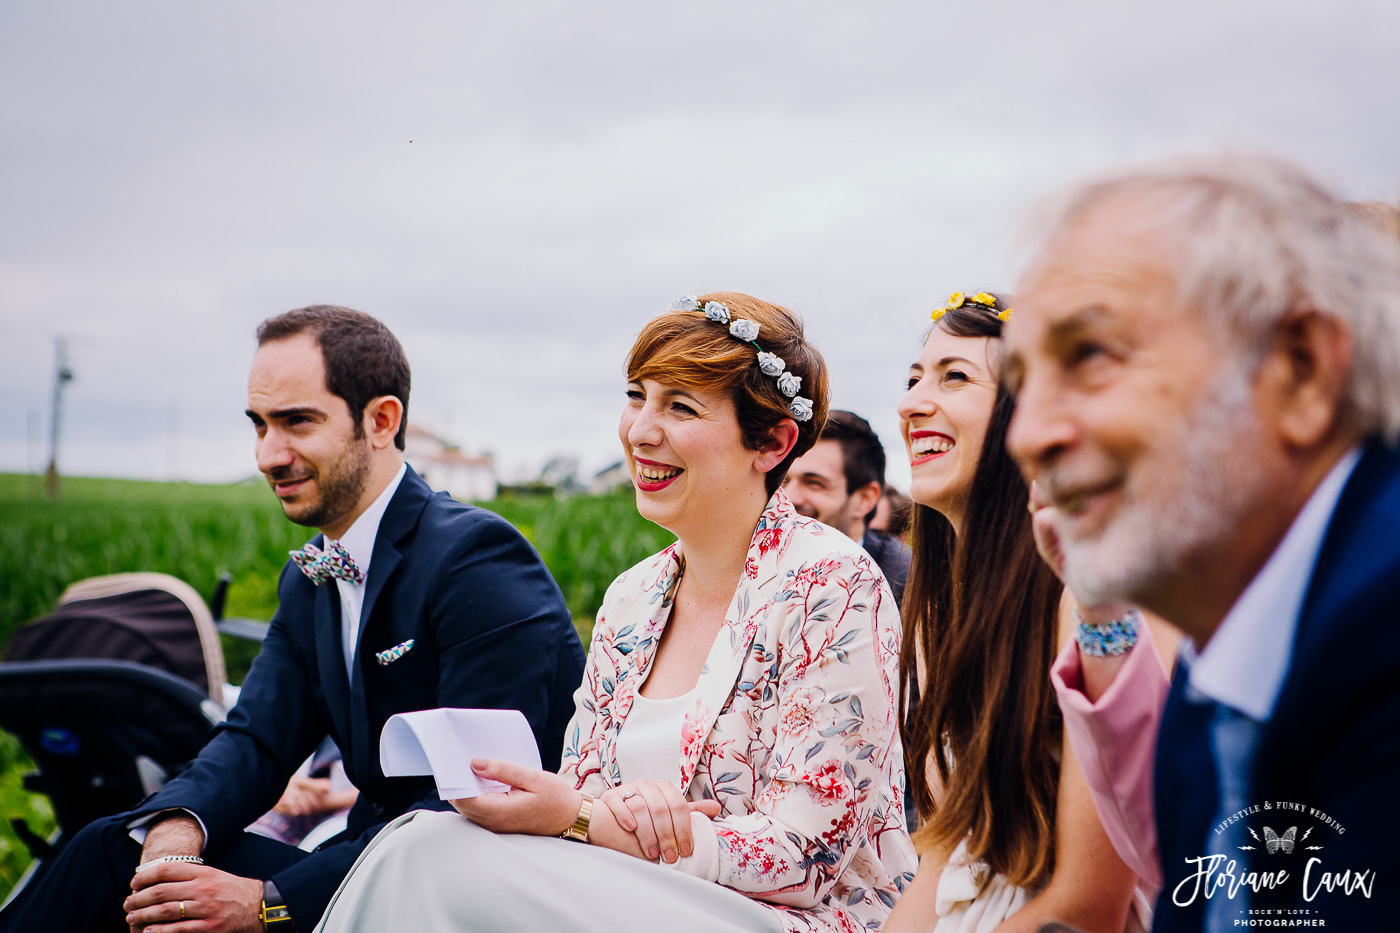 photographe-mariage-pays-basque-Floriane-Caux (27)